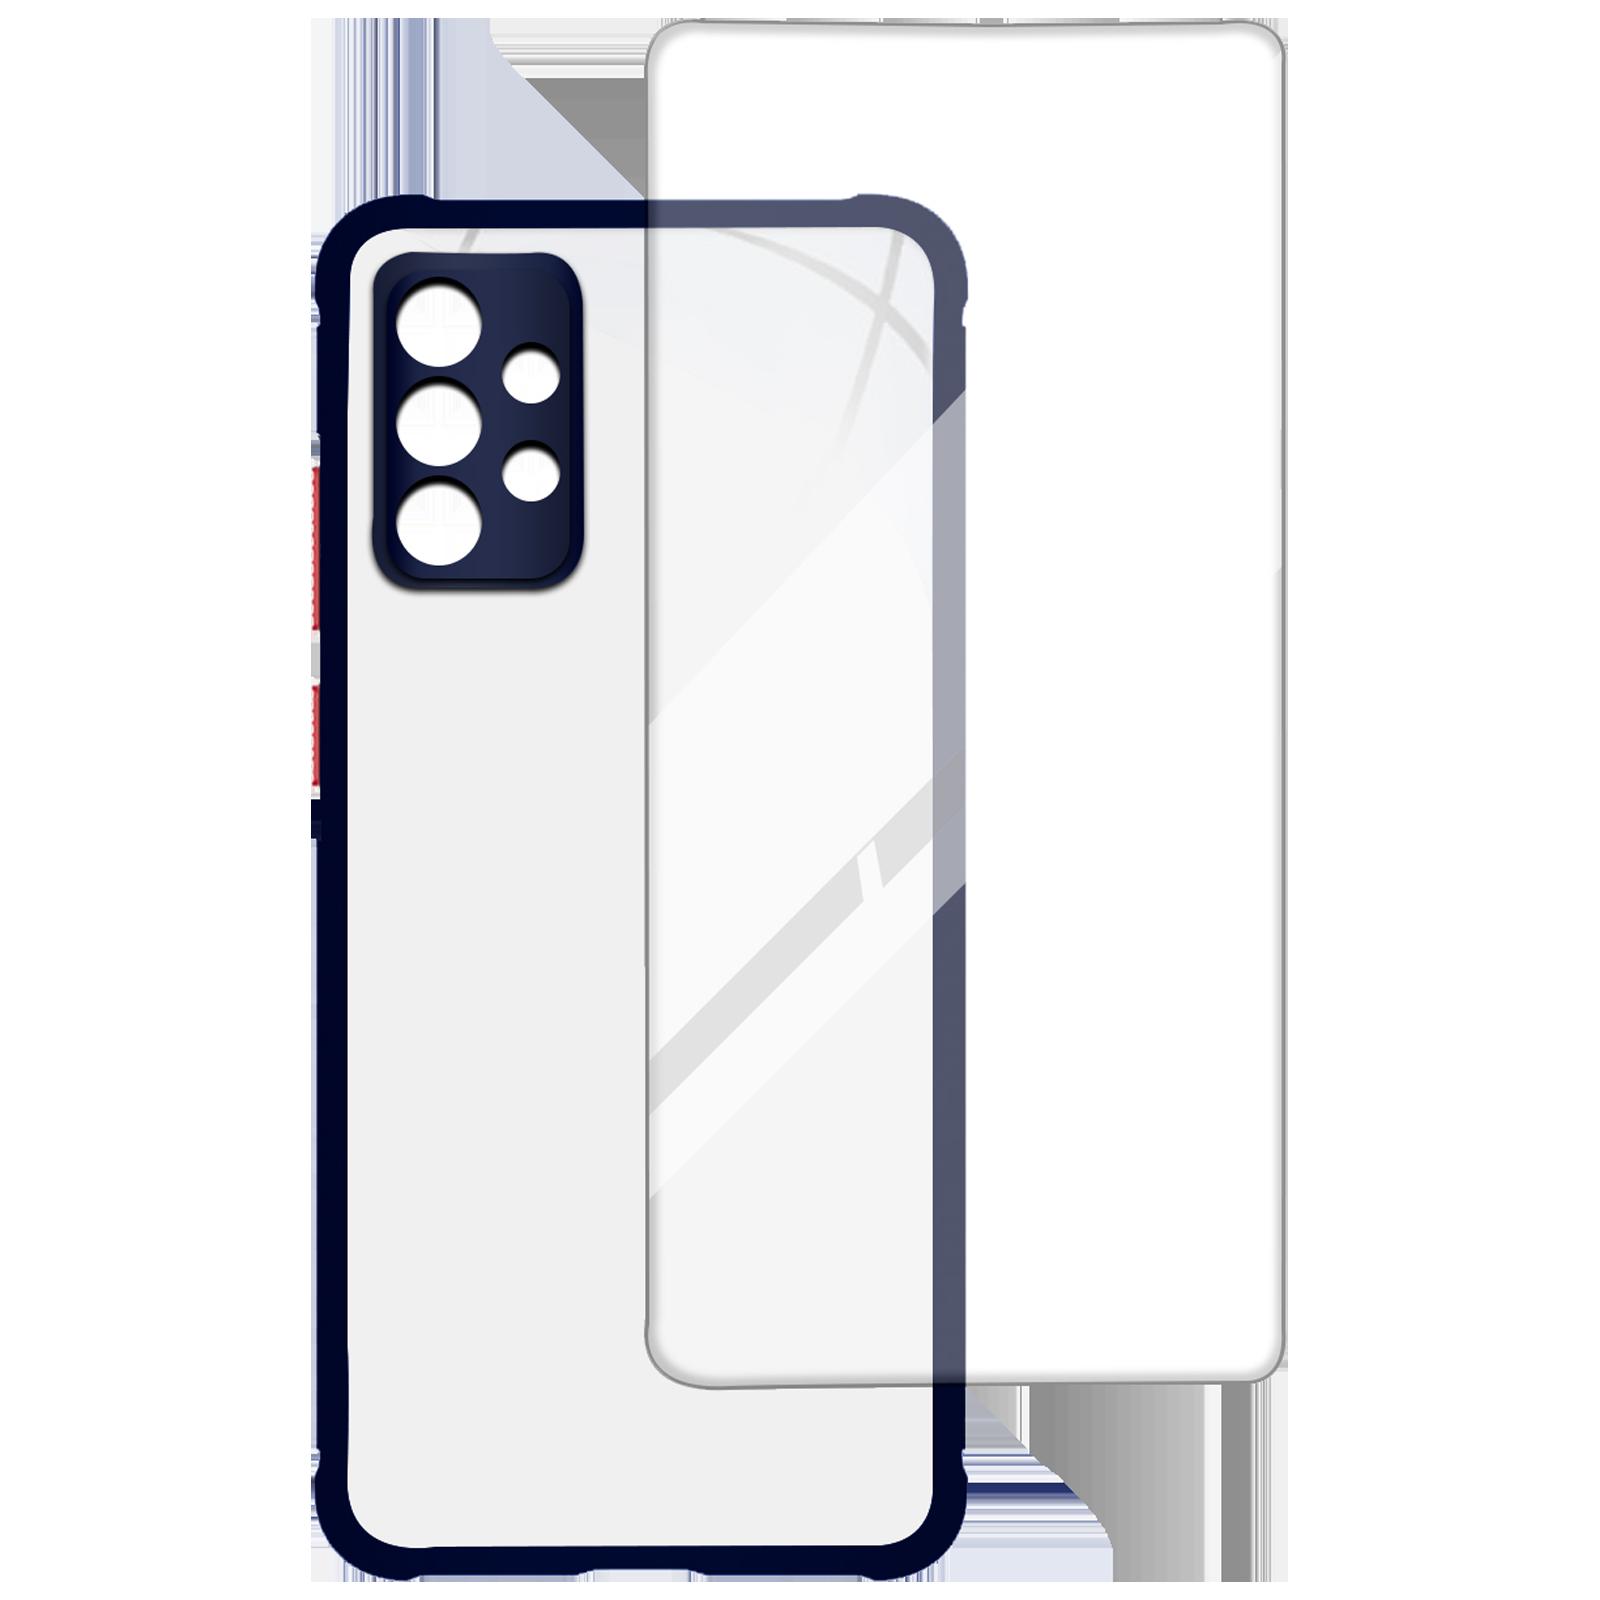 Arrow Hybrid Back Case and Screen Protector Bundle For Samsung Galaxy A72 (Oleophobic Coated, AR-969, Blue)_1